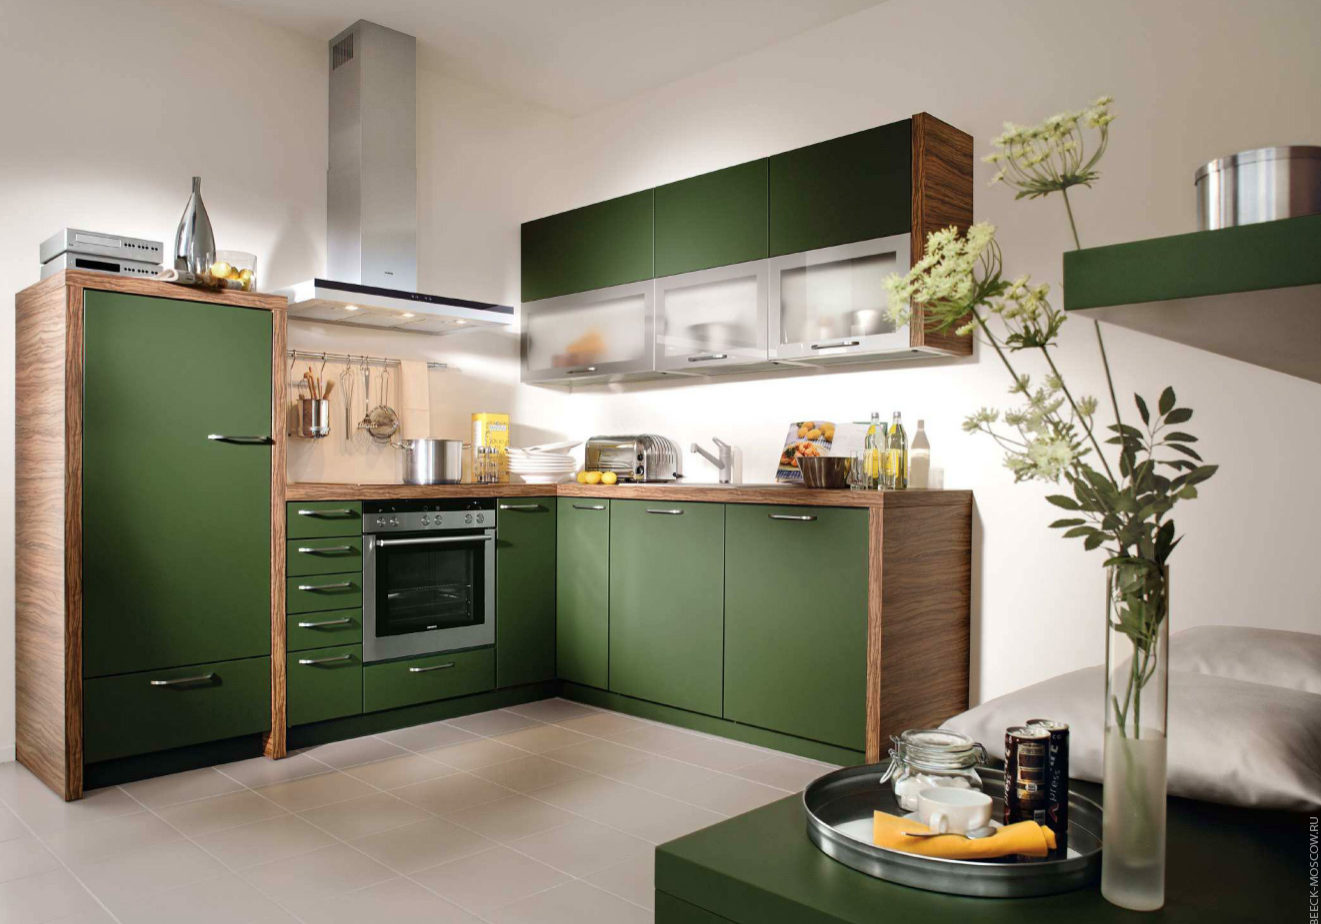 Угловая зеленая кухня с матовыми фасадами